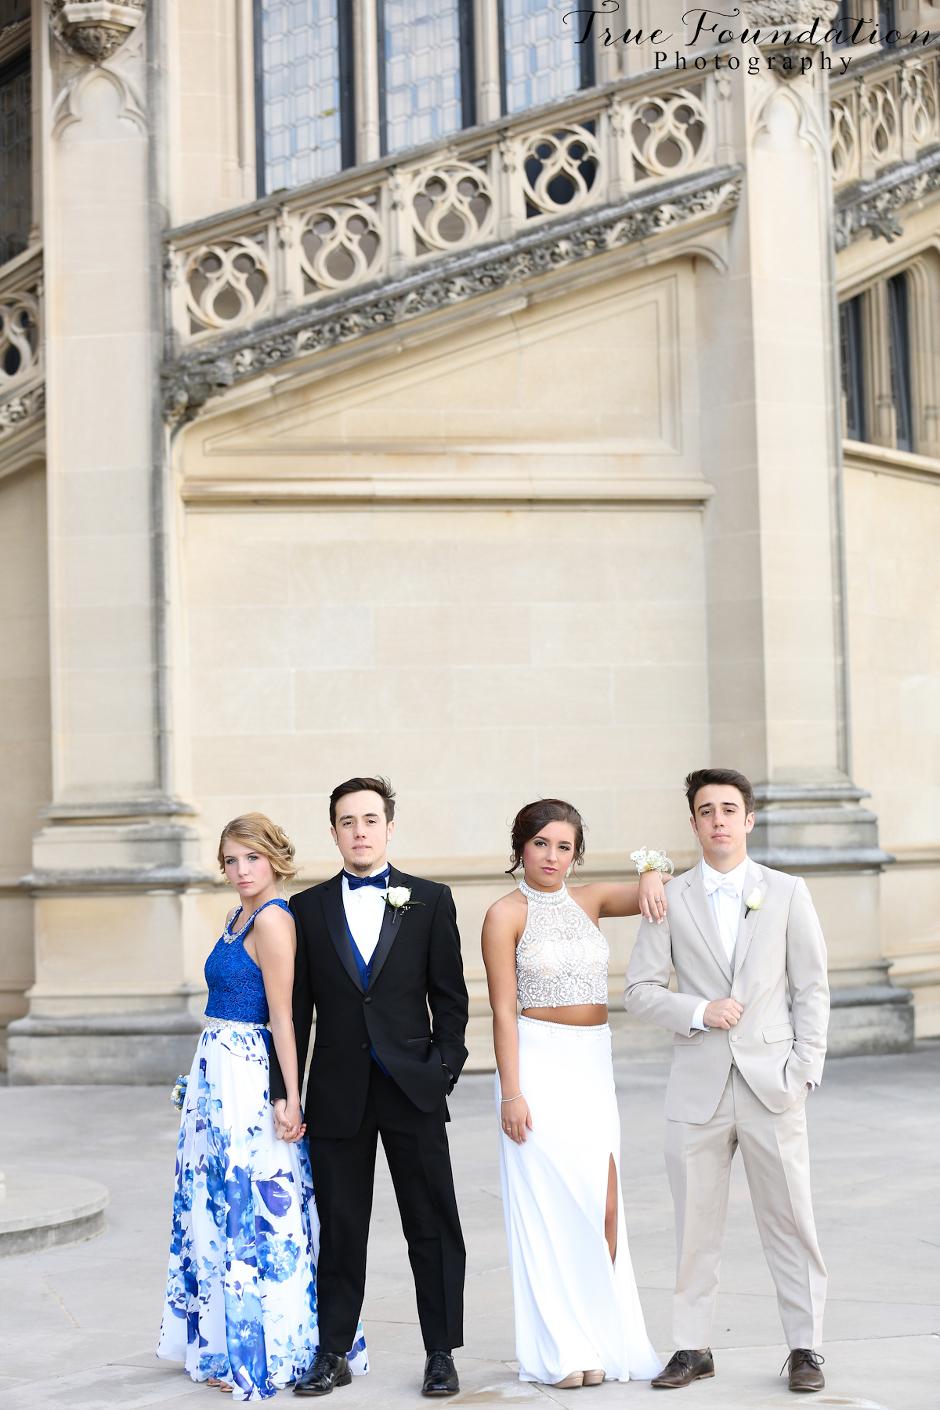 Senior - Prom - Photography - Photos - North - Carolina - NC - Photographer - Biltmore - Hendersonville - Greenville - Charlotte - High - School - Dance (7)